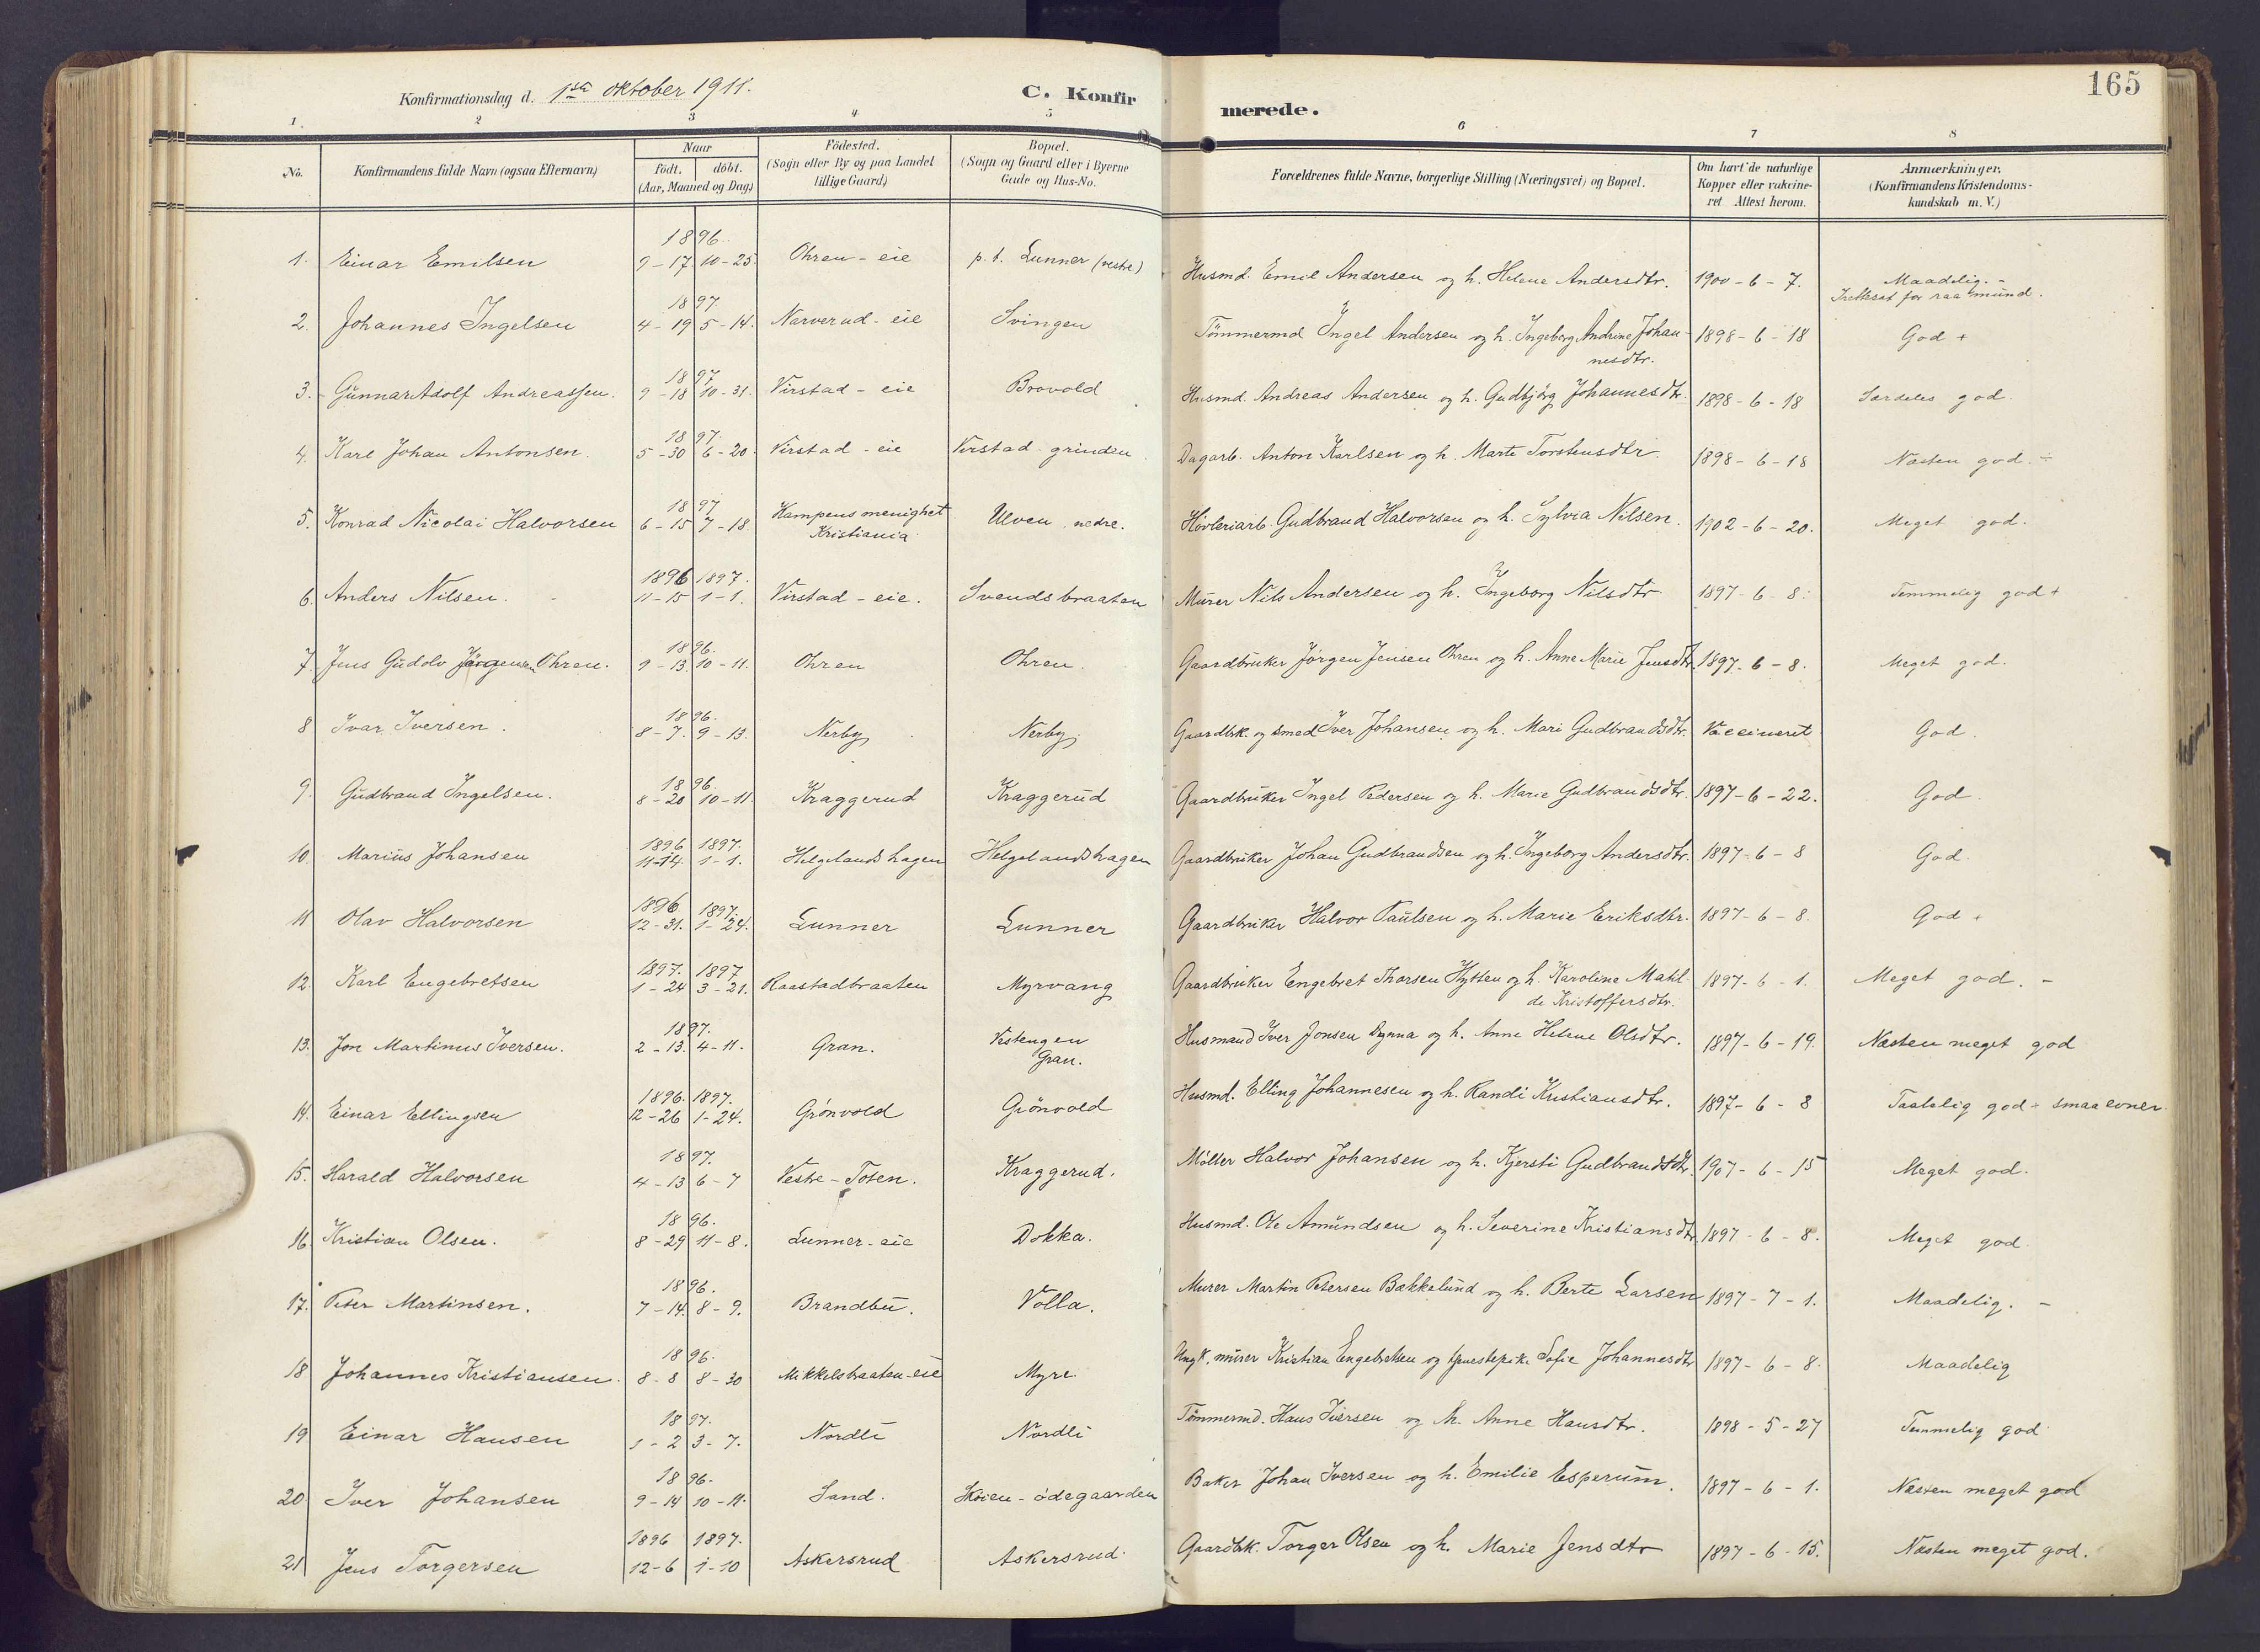 SAH, Lunner prestekontor, H/Ha/Haa/L0001: Ministerialbok nr. 1, 1907-1922, s. 165